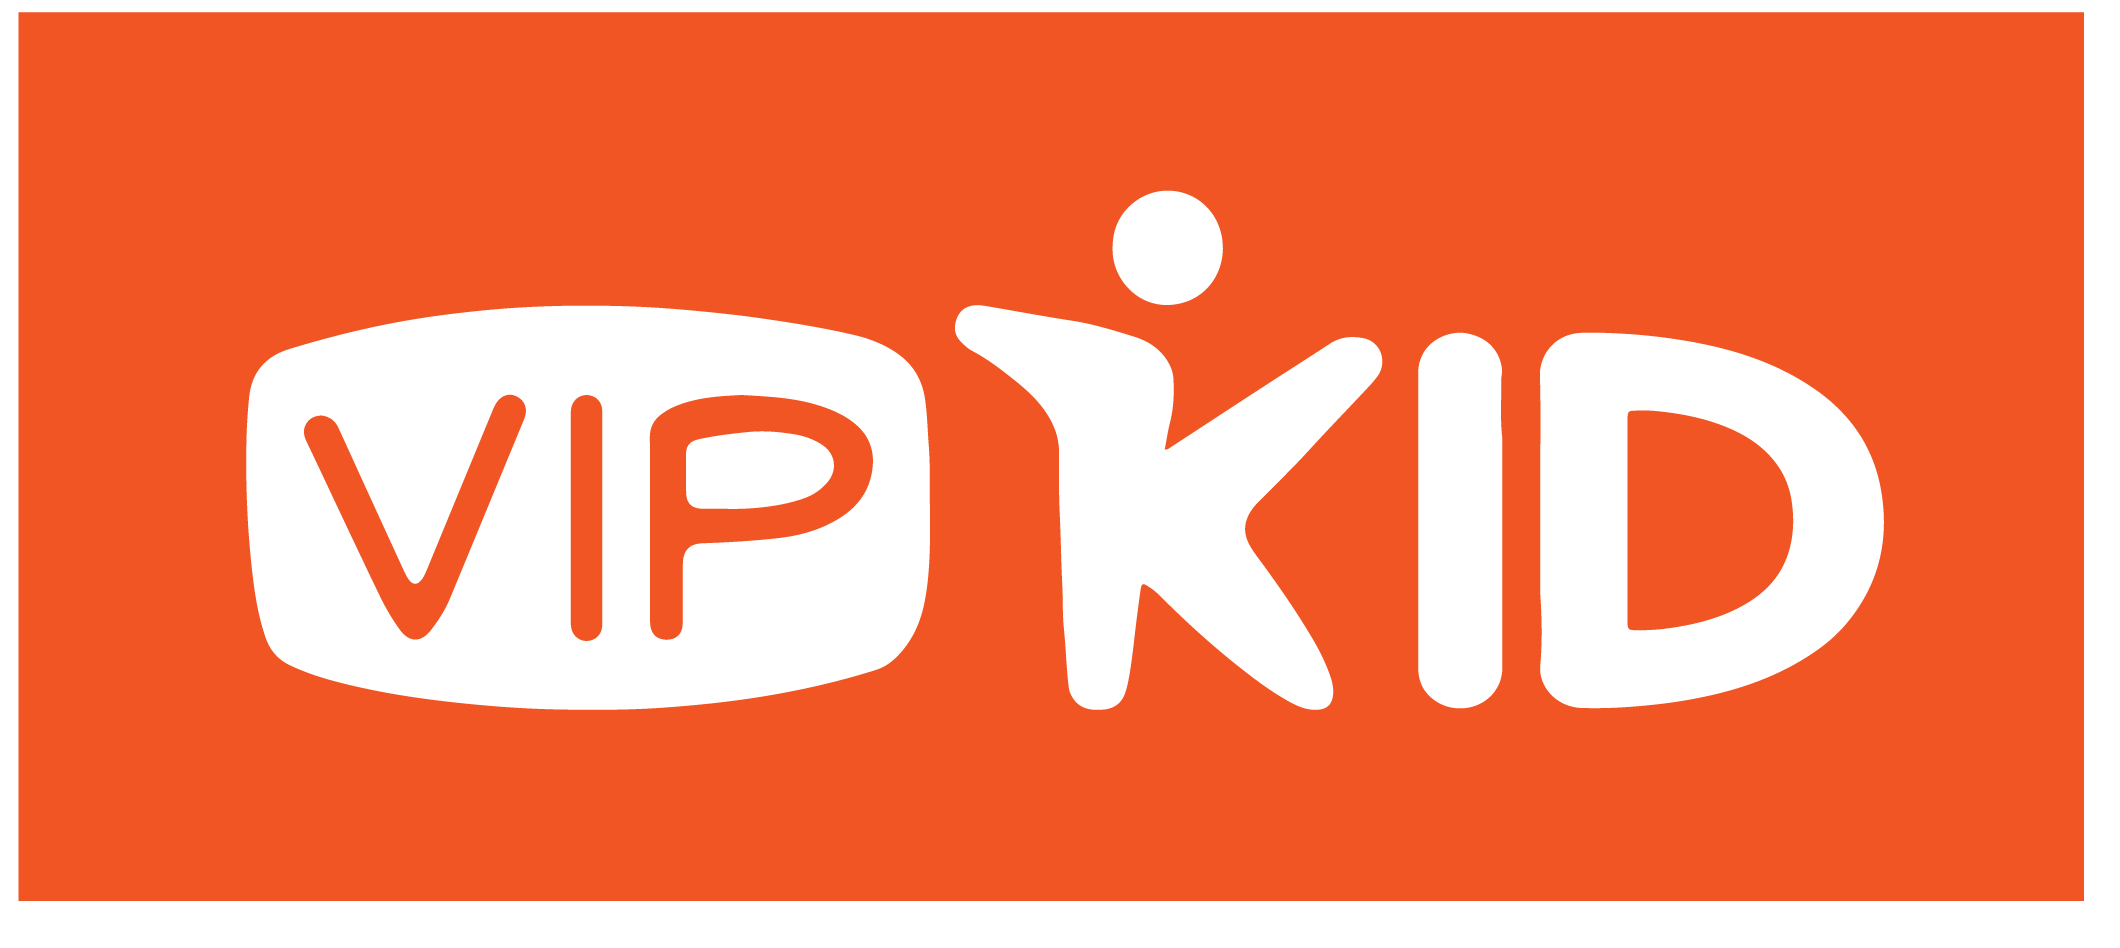 vipkid_Logo_reverse.png